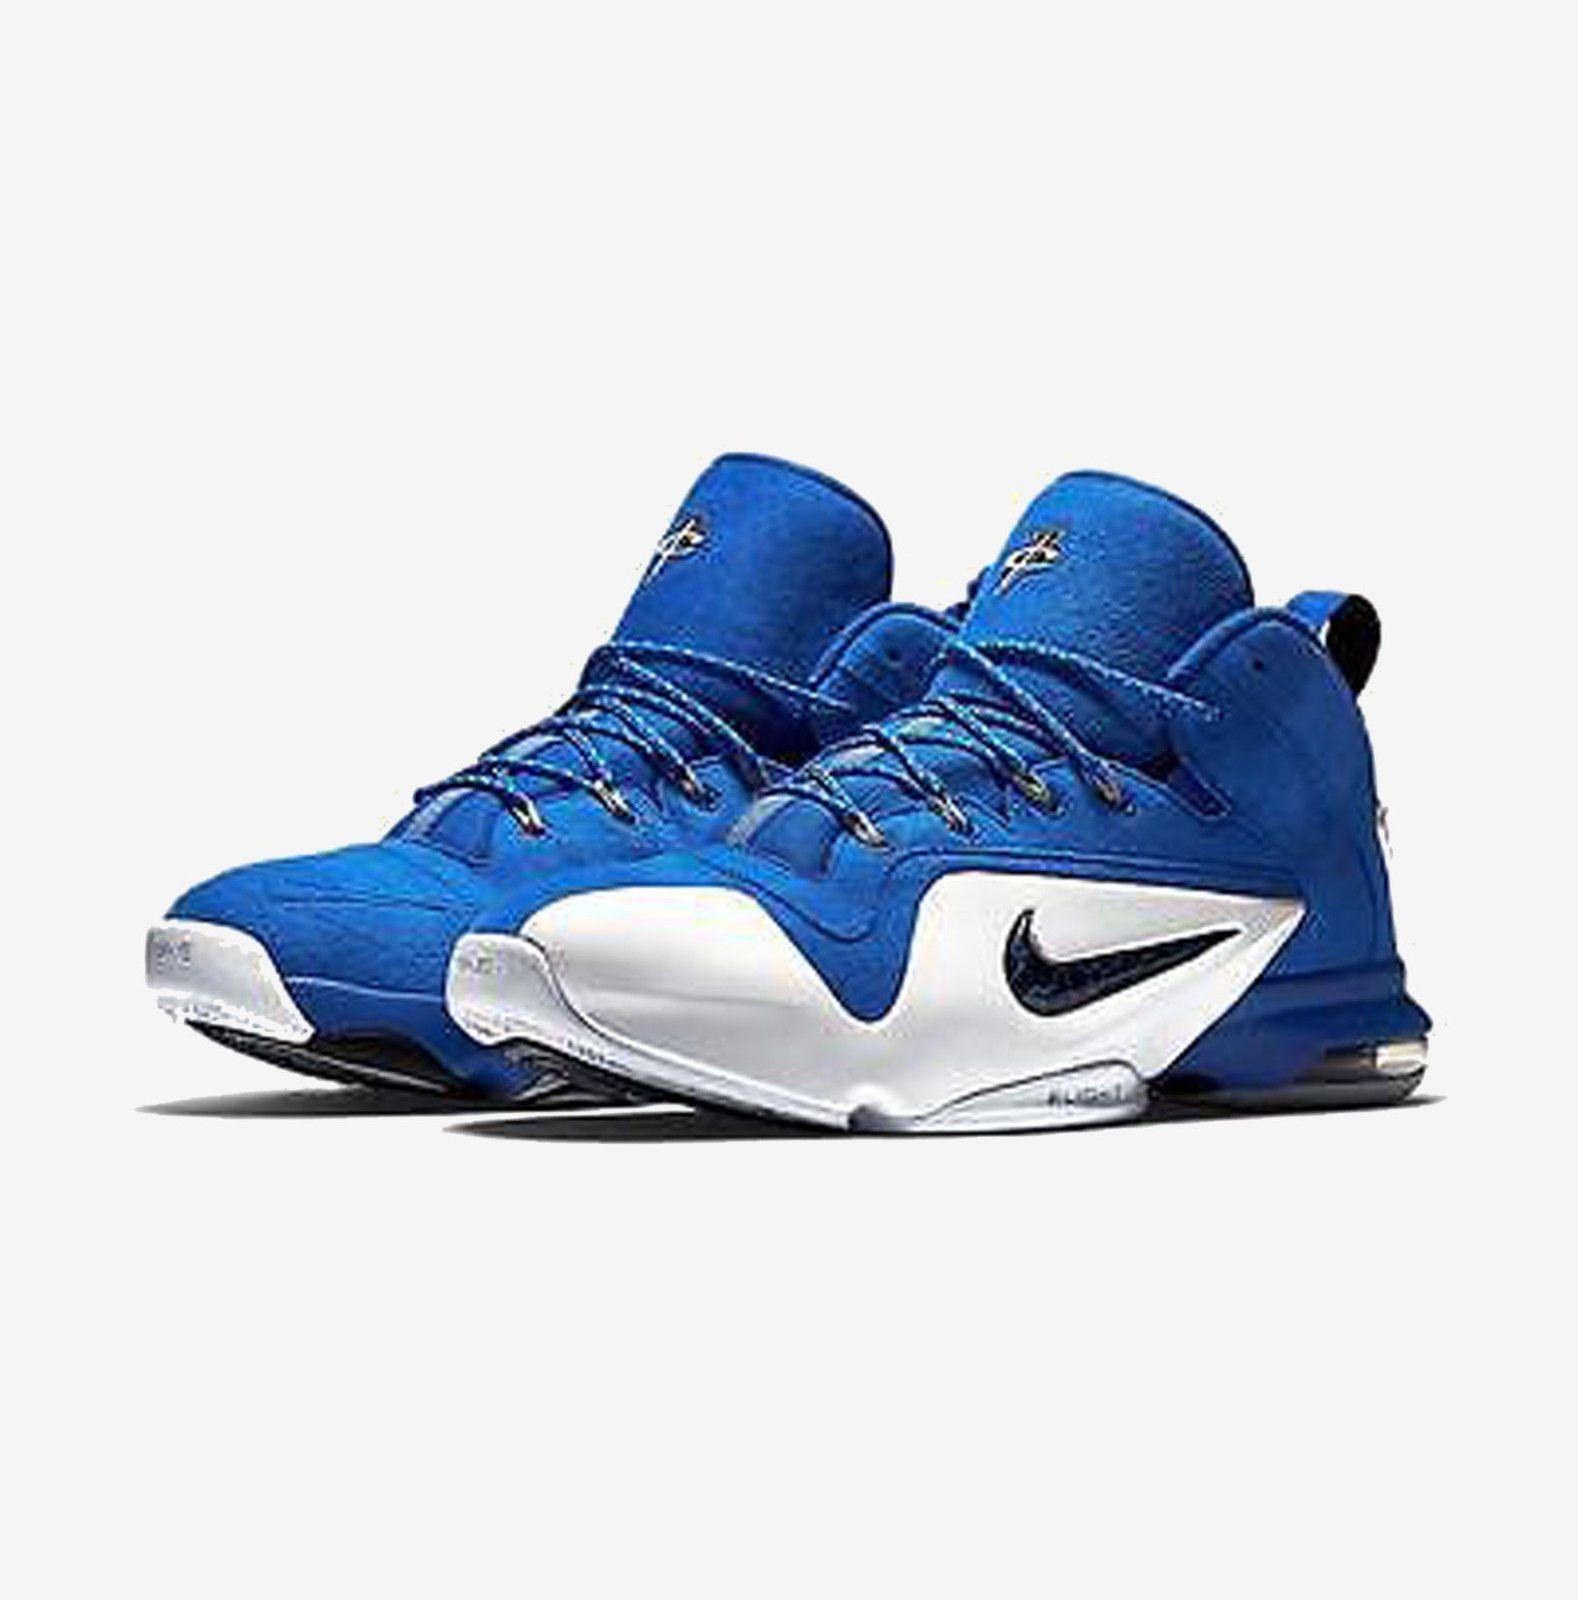 NIKE Men Size 8.5 Zoom Penny VI Basketball Sneakers visit